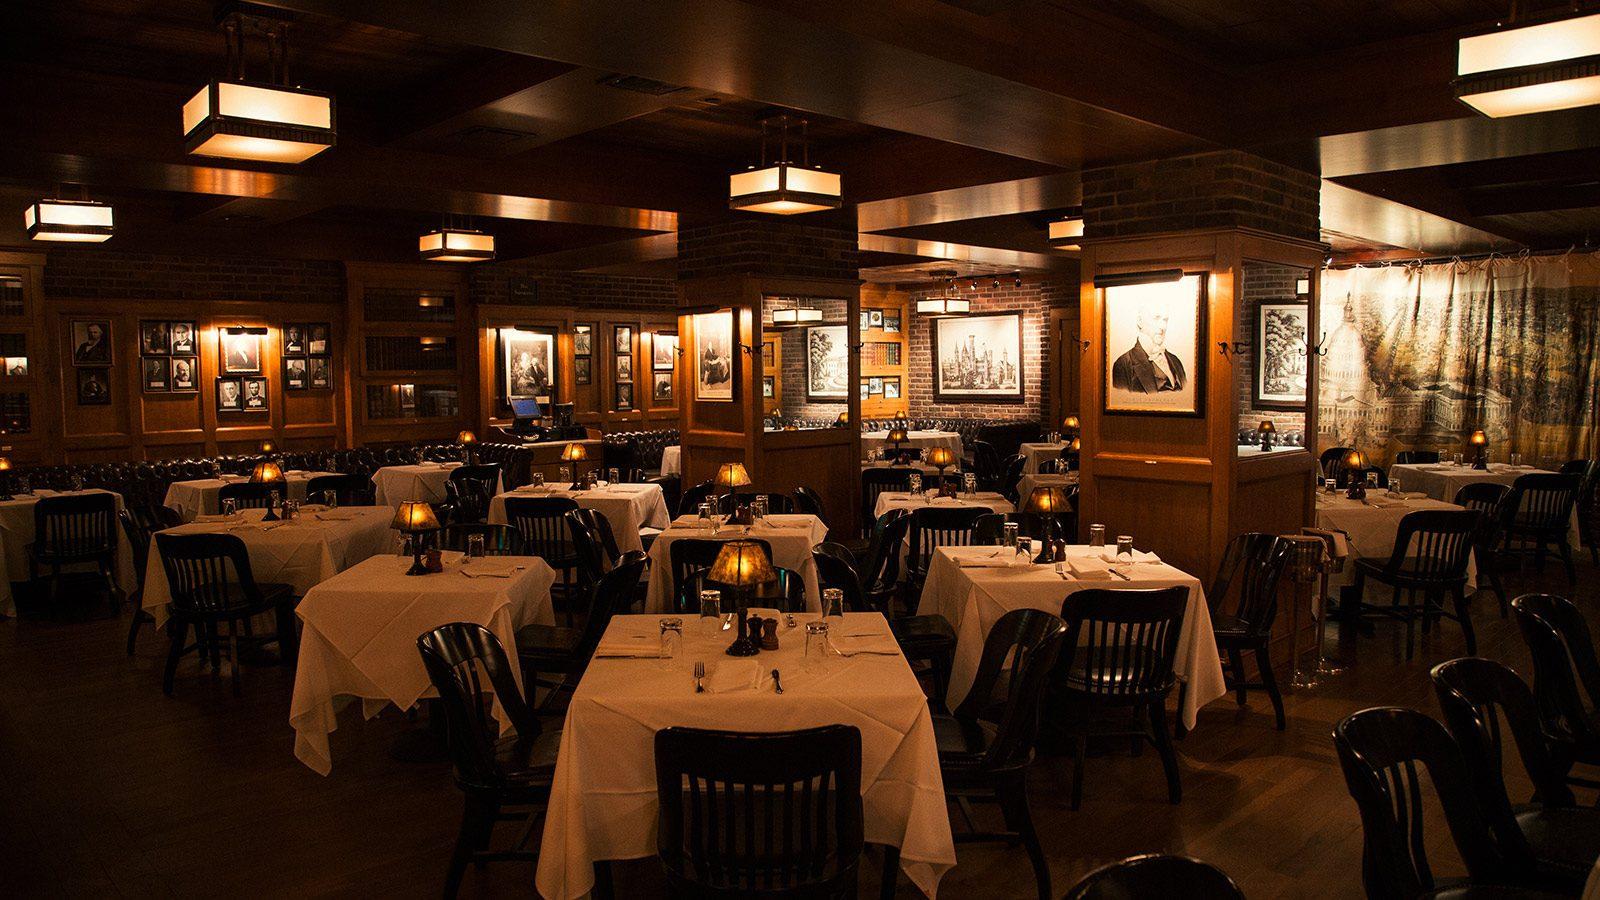 pj clarkes restaurant and bar sidecar pj clarkes